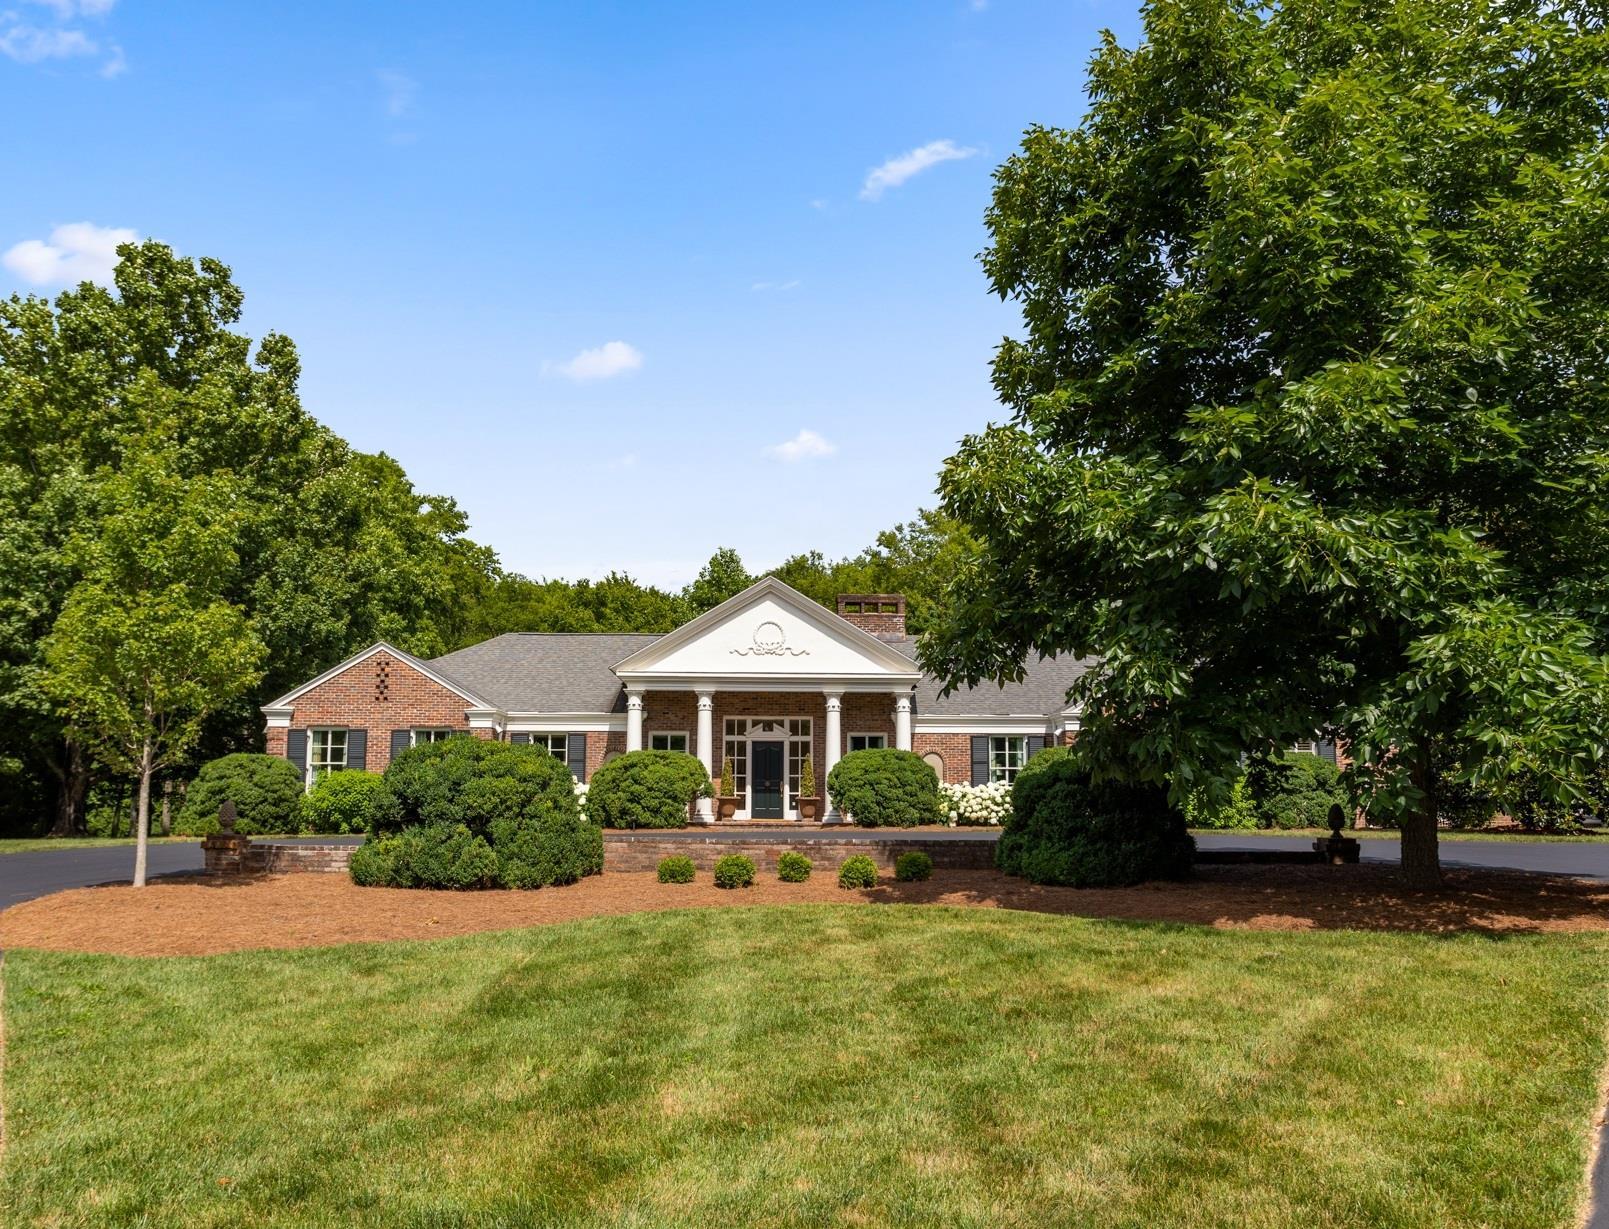 1018 Chancery Ln S, Nashville, TN 37215 - Nashville, TN real estate listing